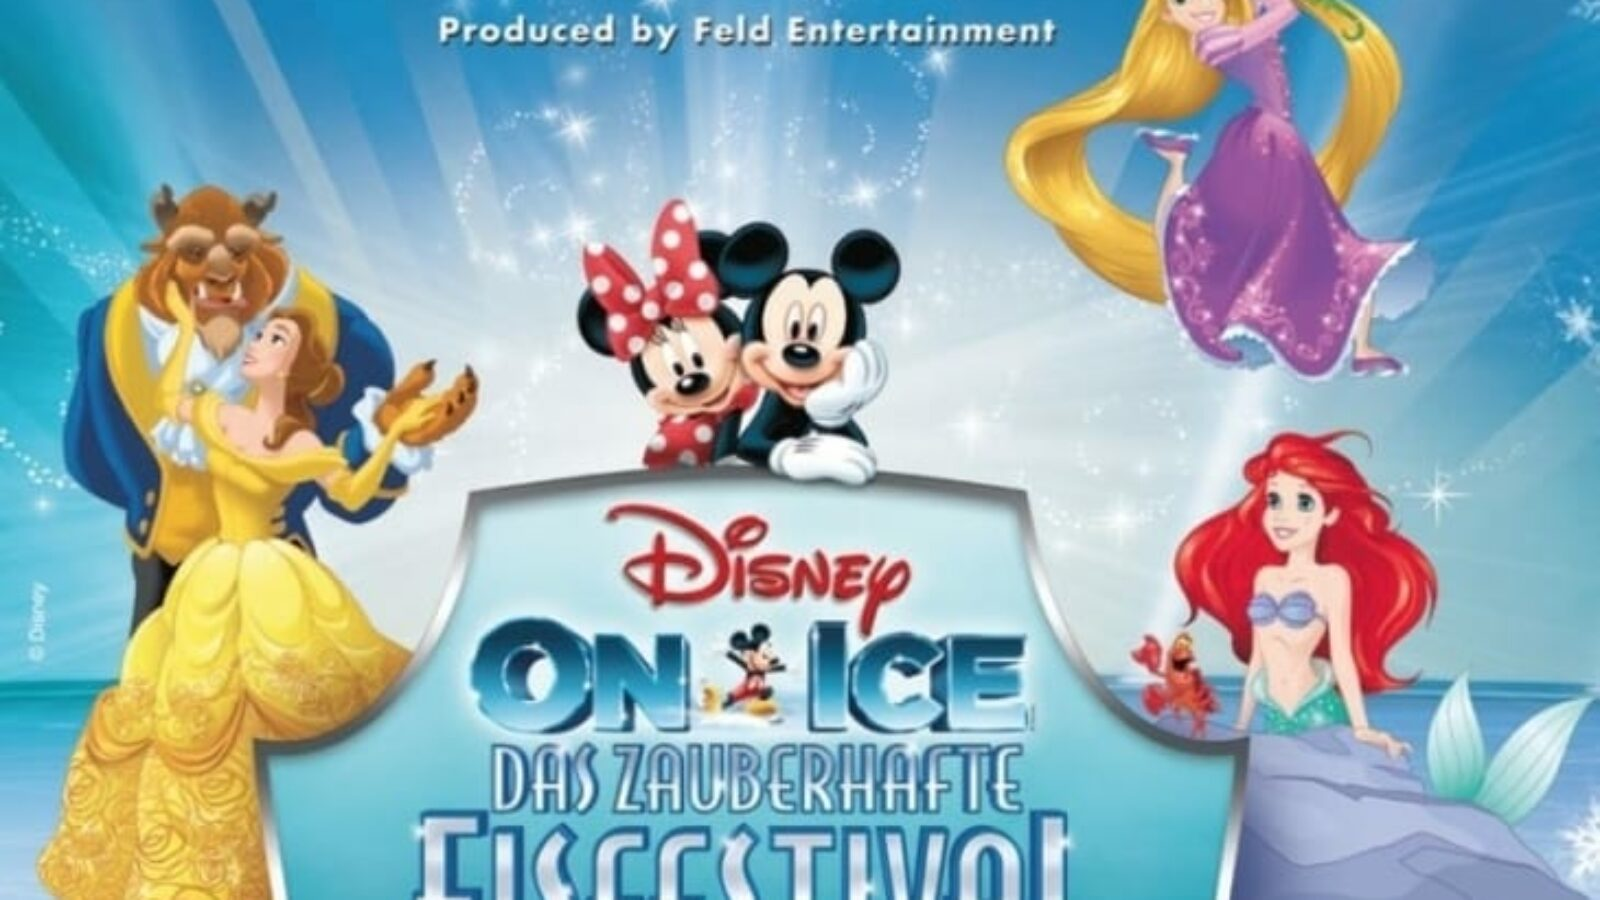 Disney on Ice 16.-18.11., Barclaycard Arena